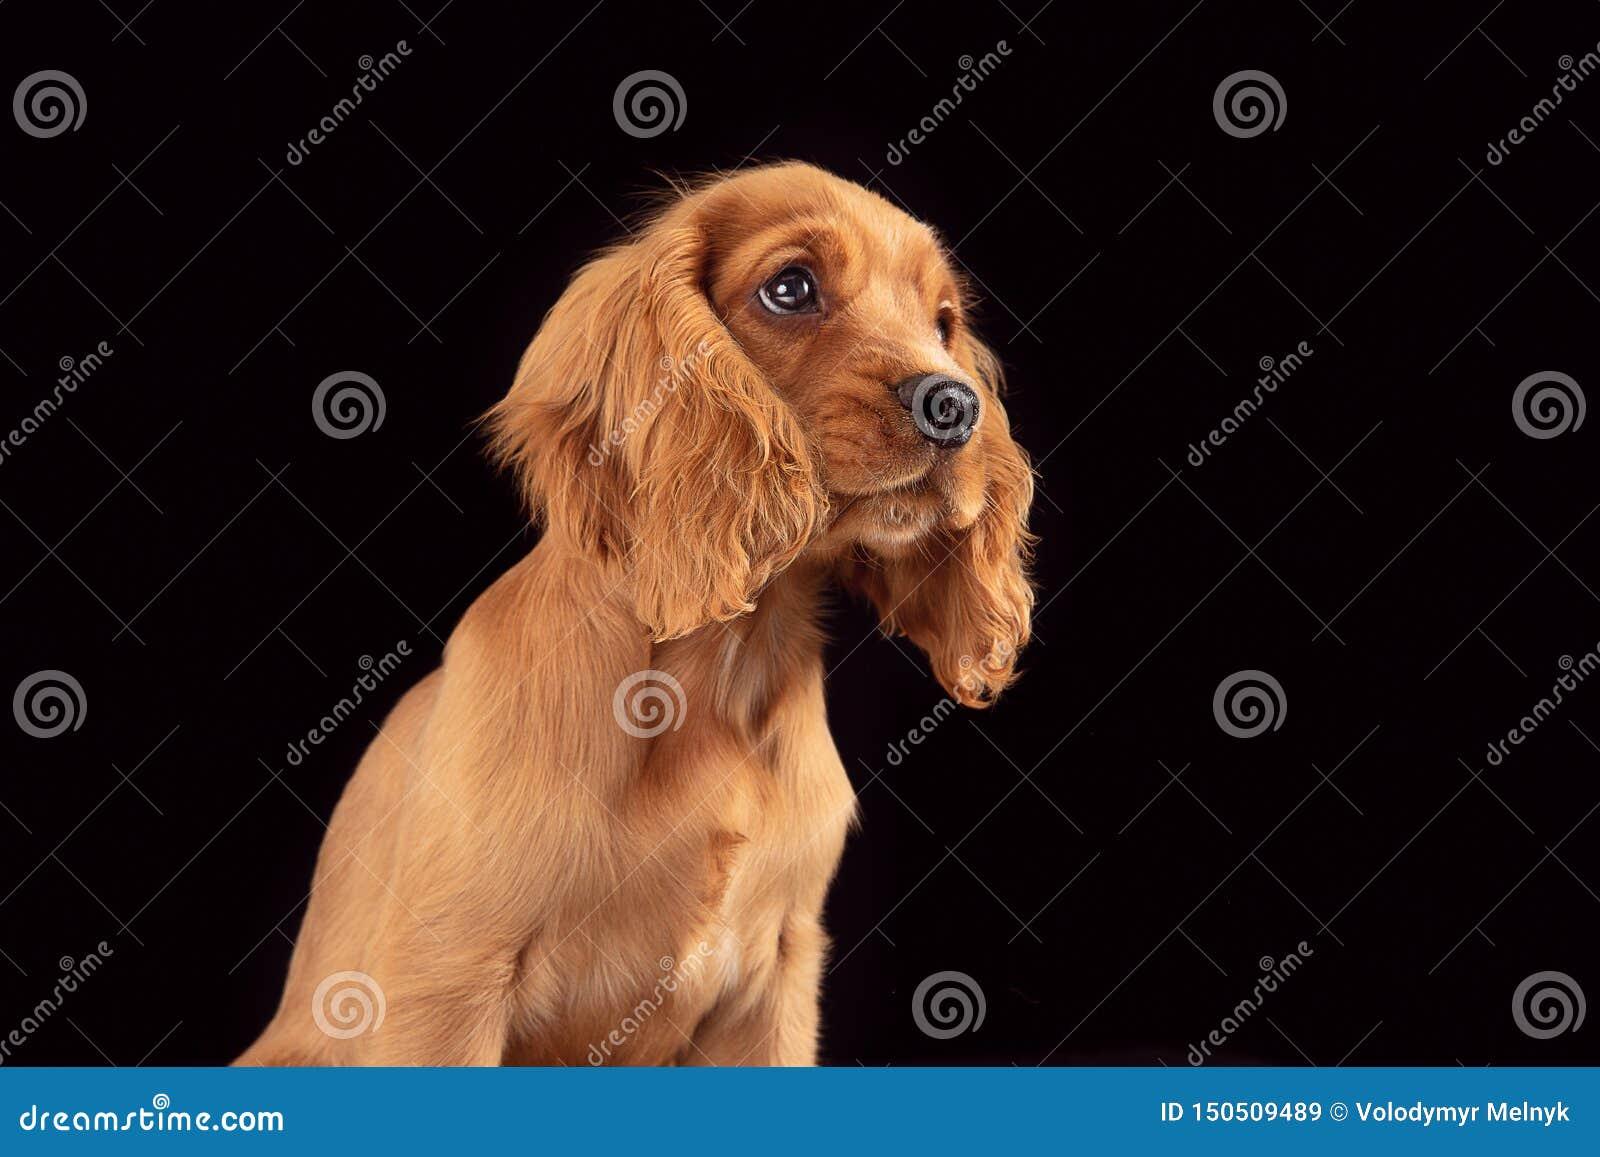 Studio shot of english cocker spaniel dog isolated on black studio background